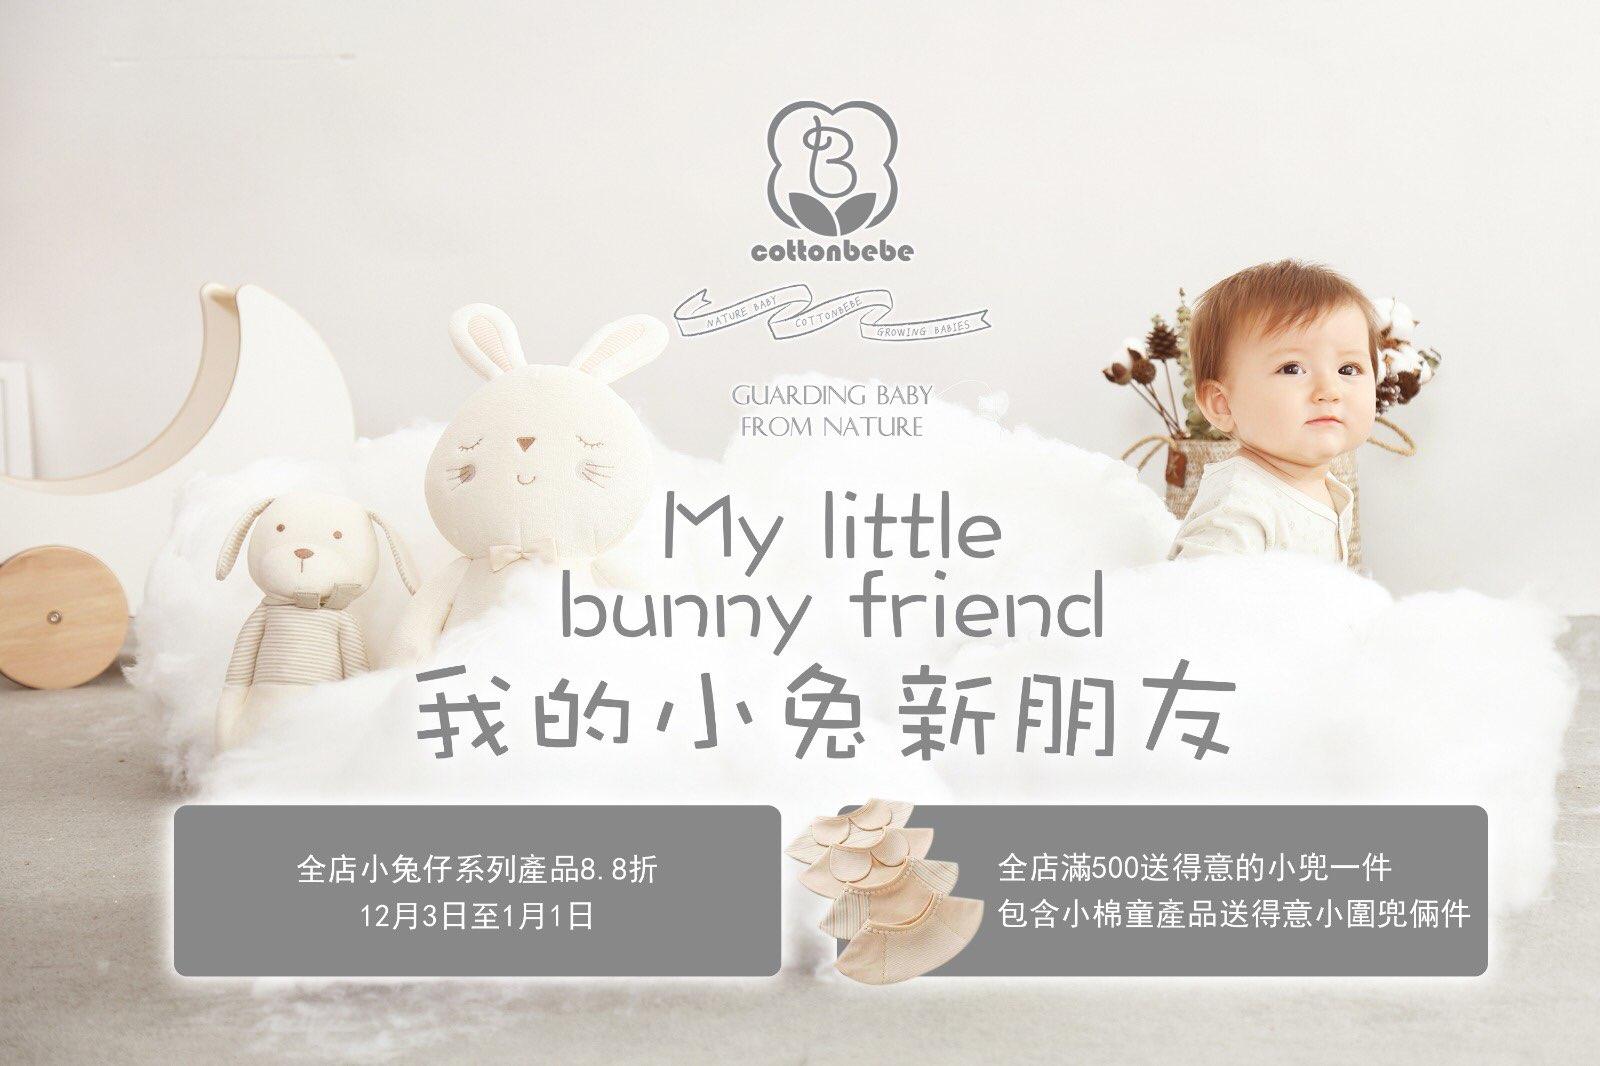 0/3 baby collection 海港城旗艦店全新面貌登場